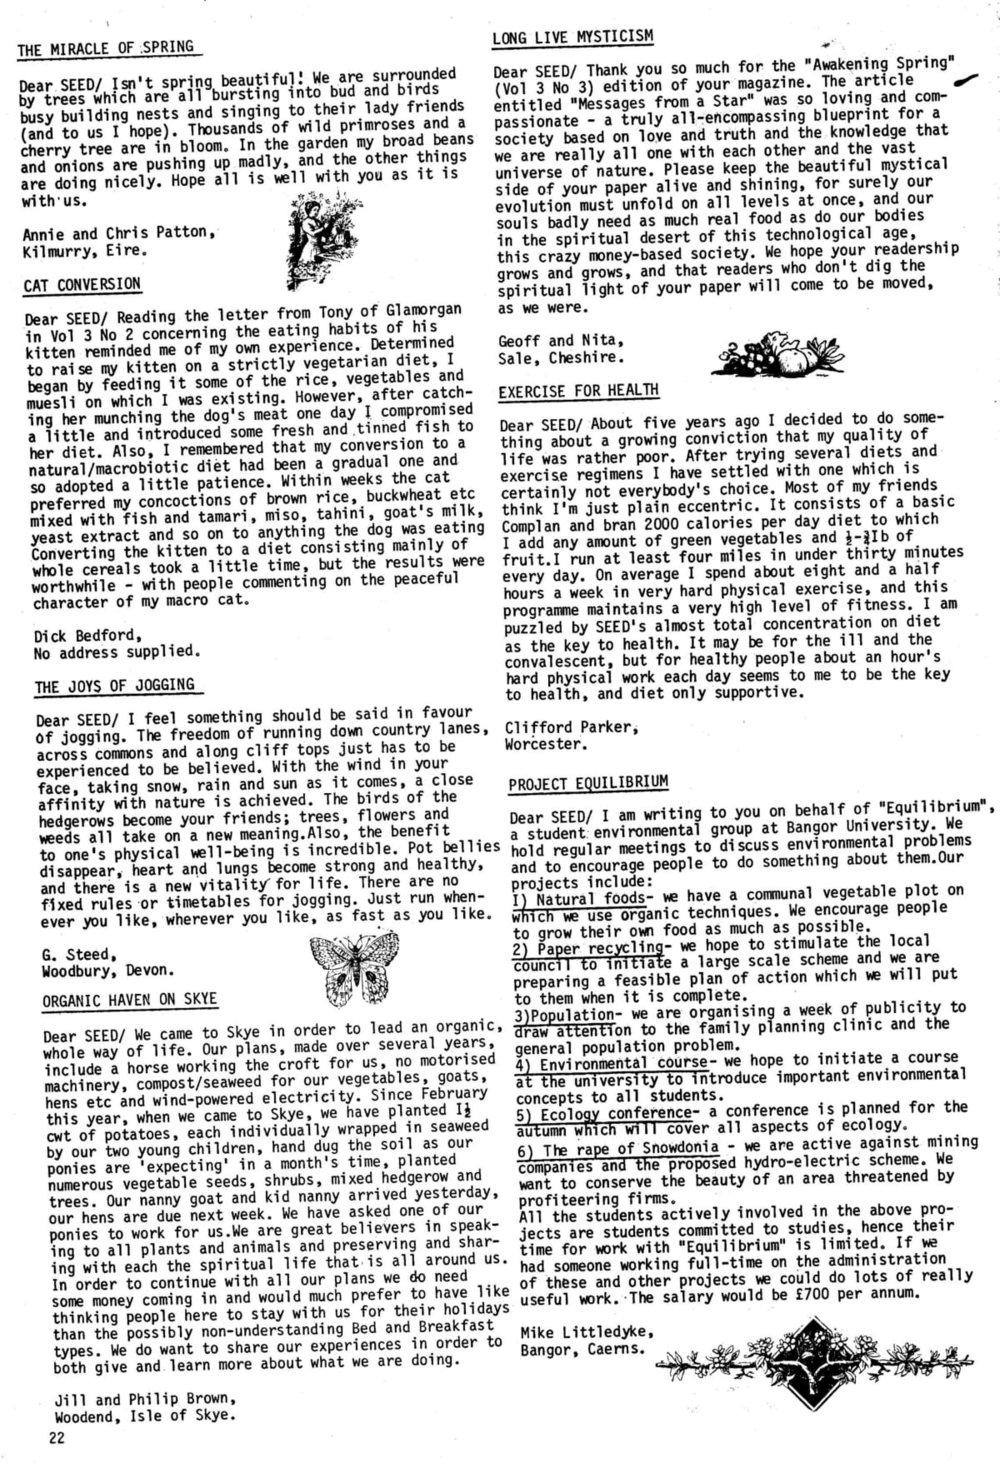 seed-v3-n5-may1974-22.jpg